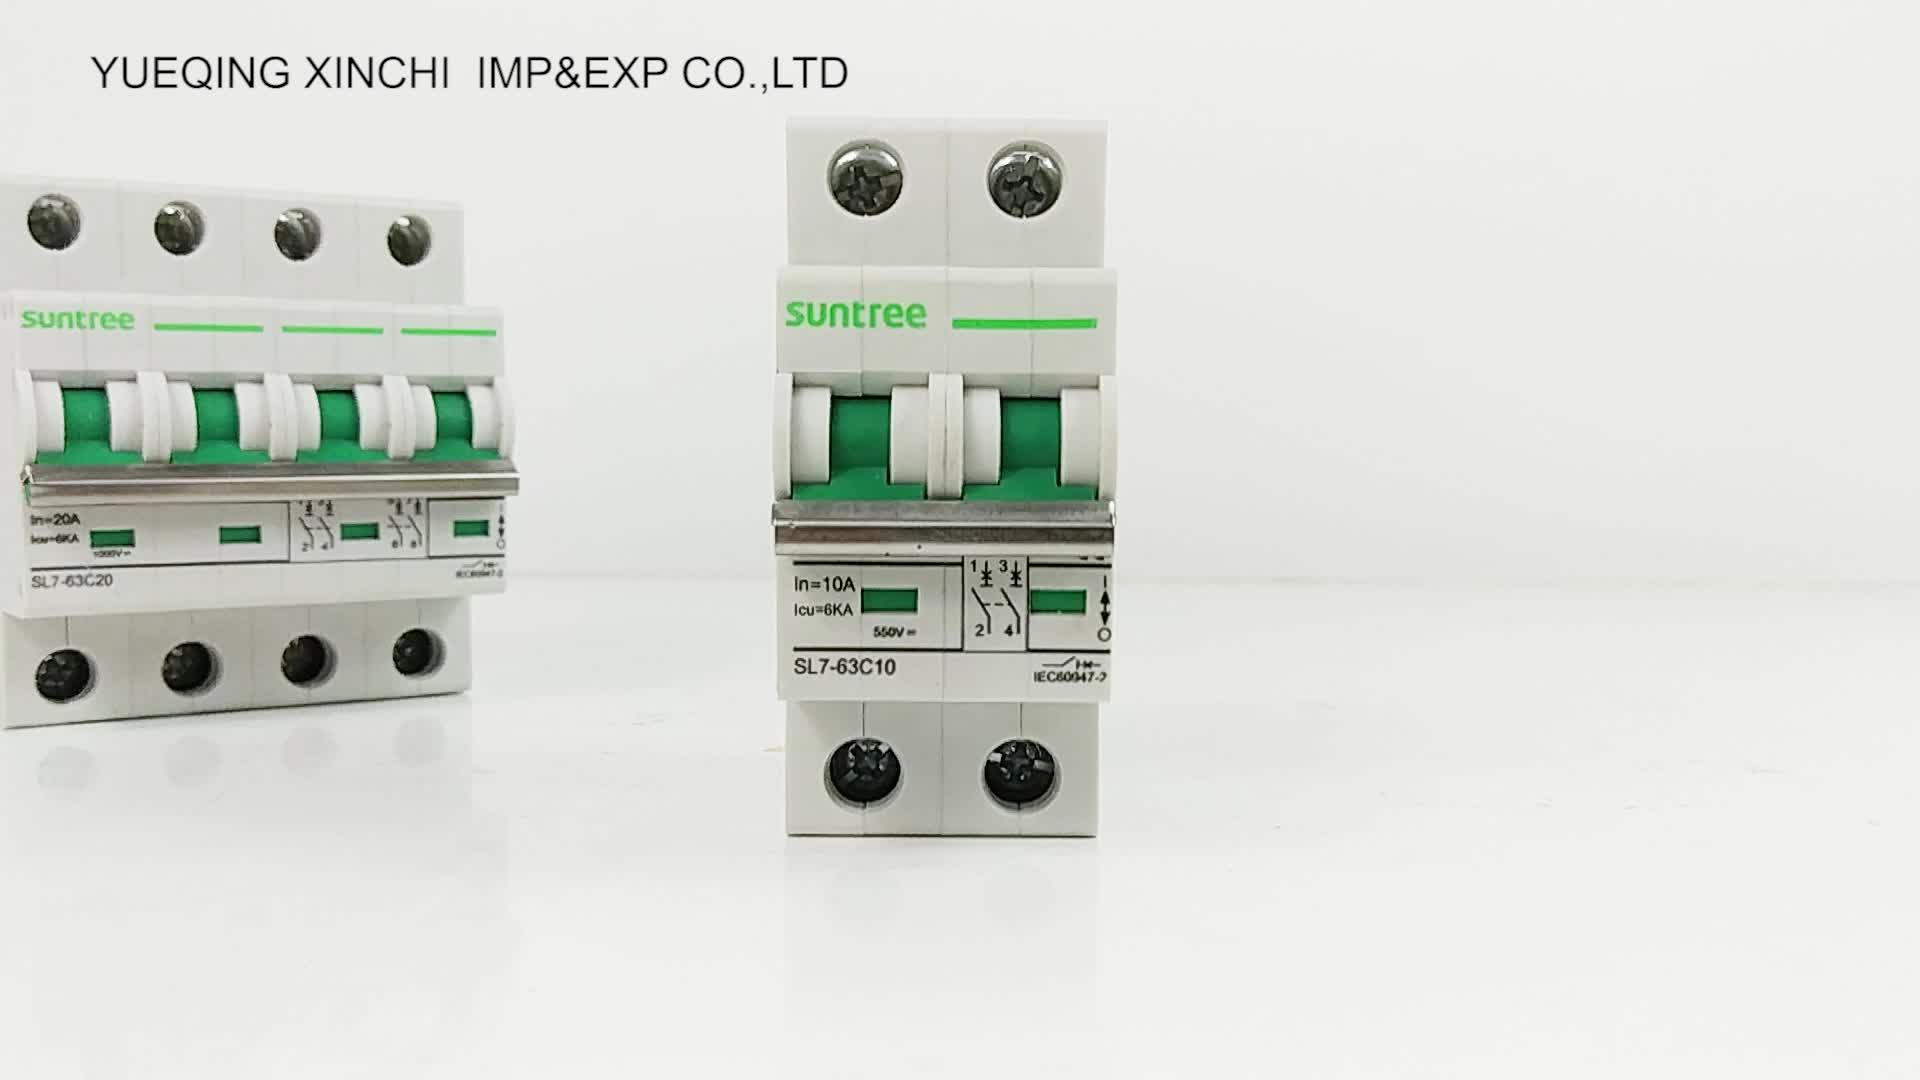 DC MCB High Quality Miniature Circuit Breaker IEC, TUV, SAA,CE Certificate Solar Photovoltaic DC Suntree Breaker